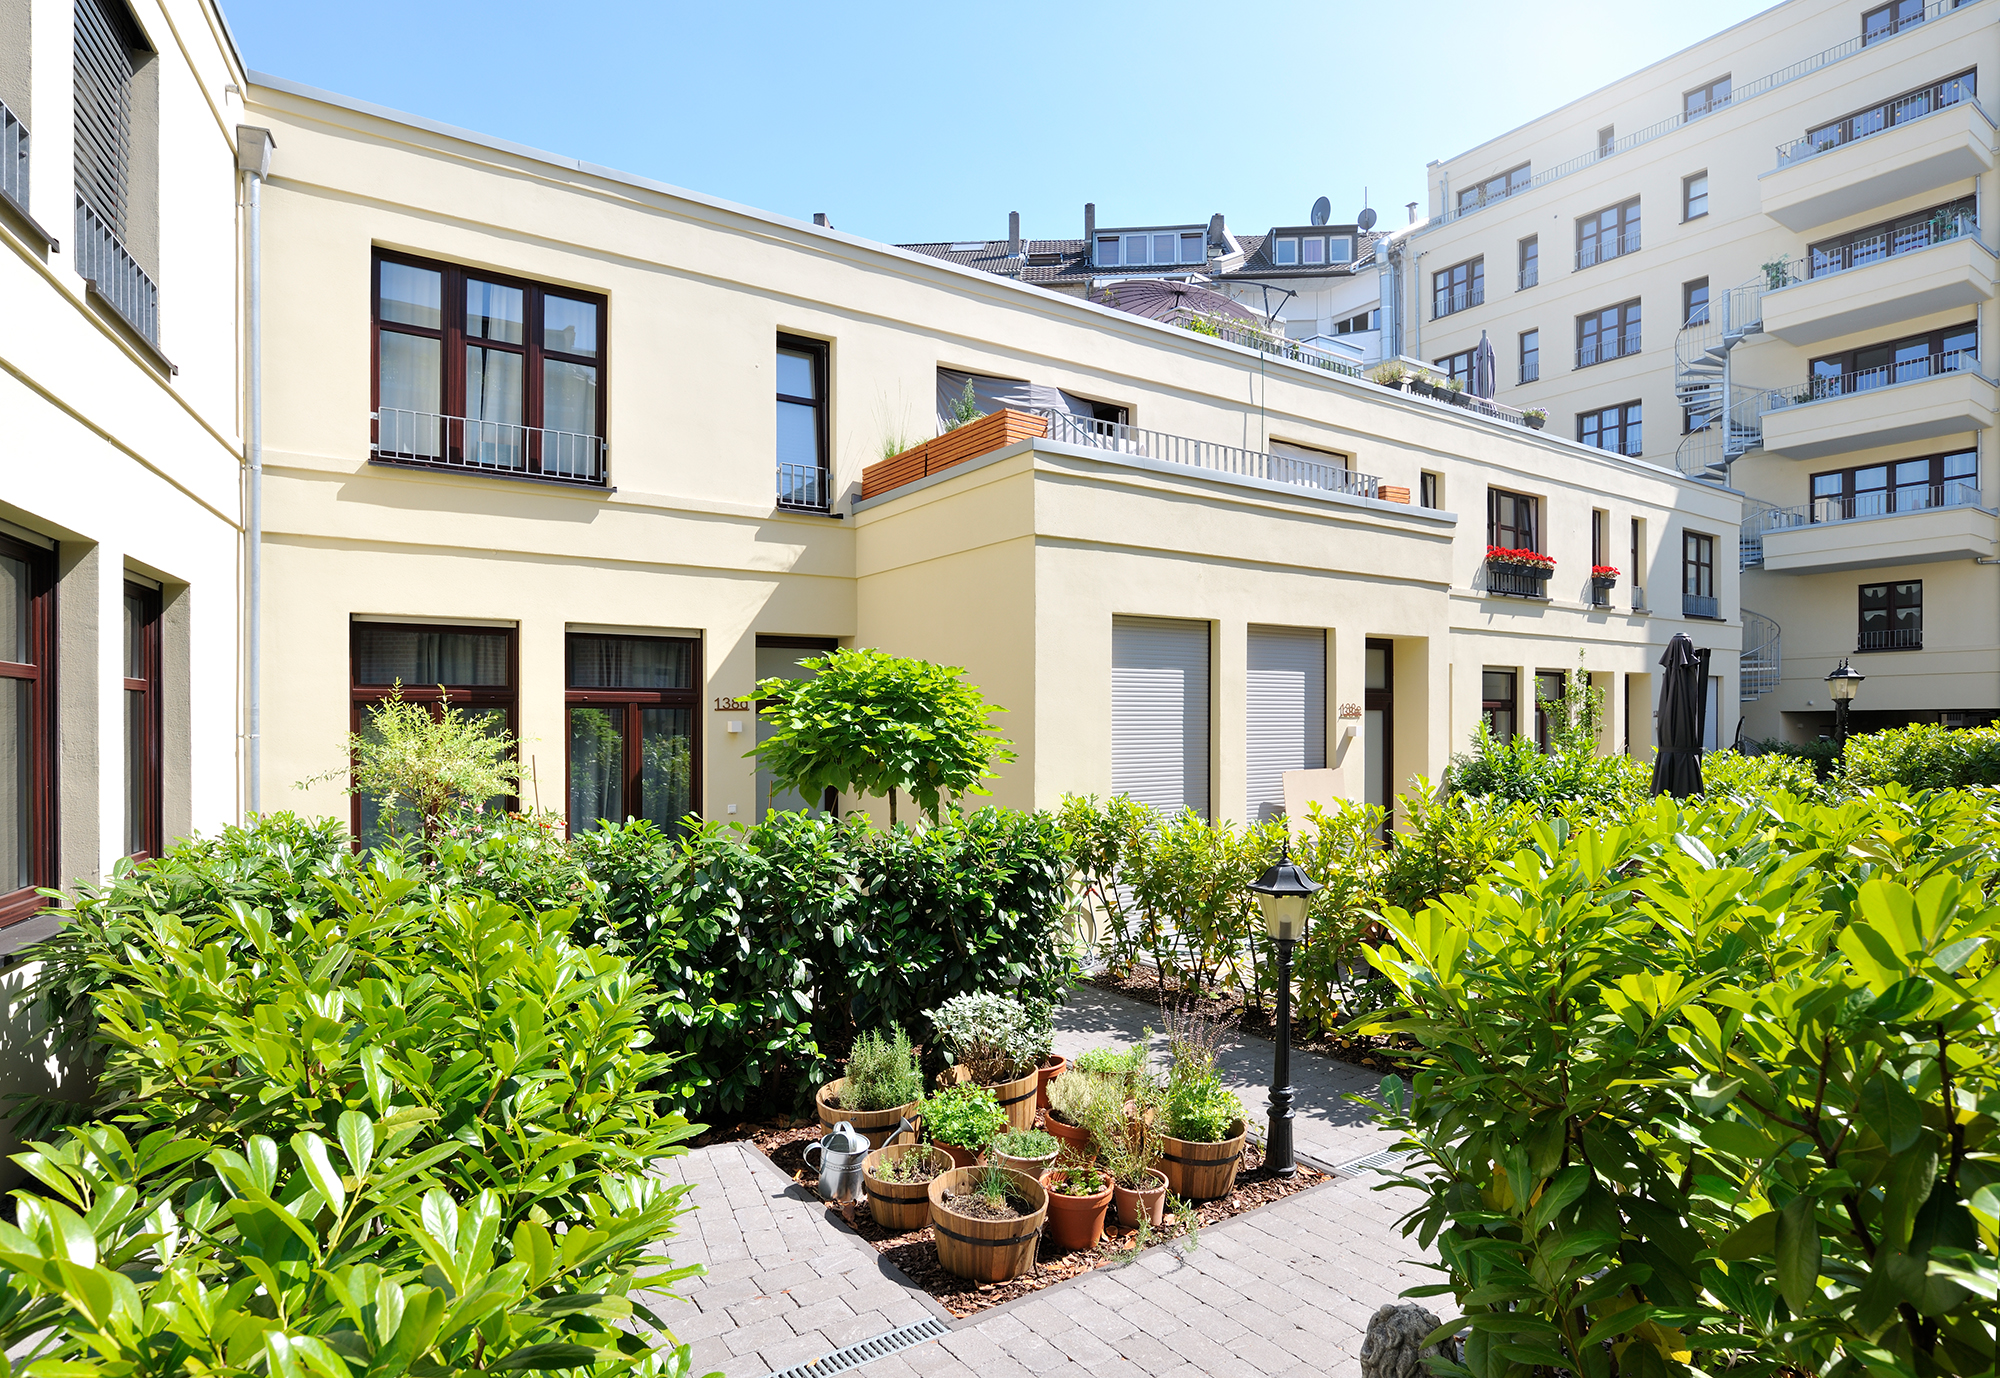 heckundschmiegel-projekte-klosterstrasse-5